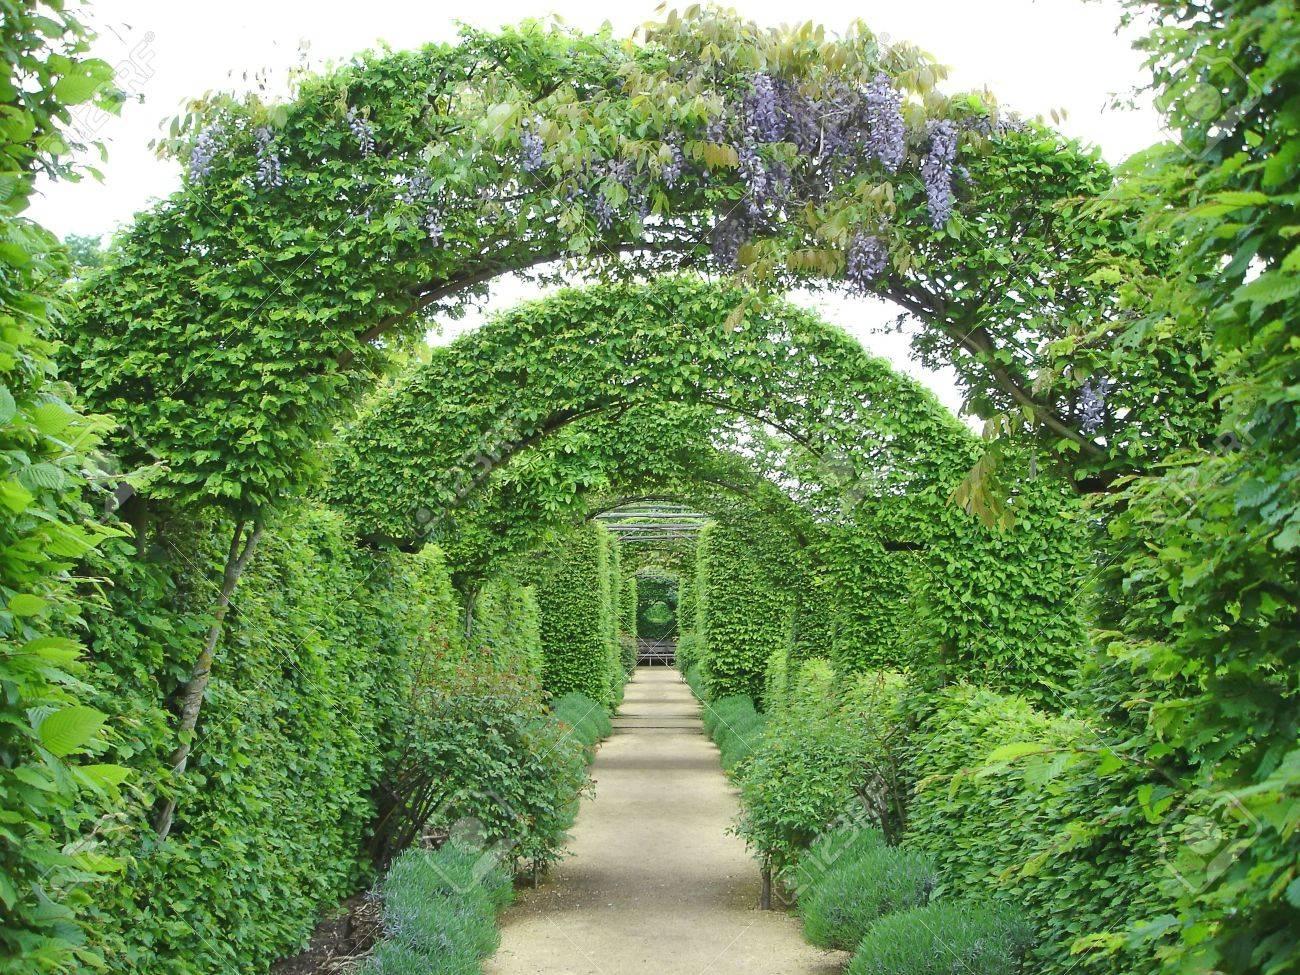 Jardin Camino Bajo Arcos De Flores Prieure Notre Dame D Orsan - Arcos-de-jardin